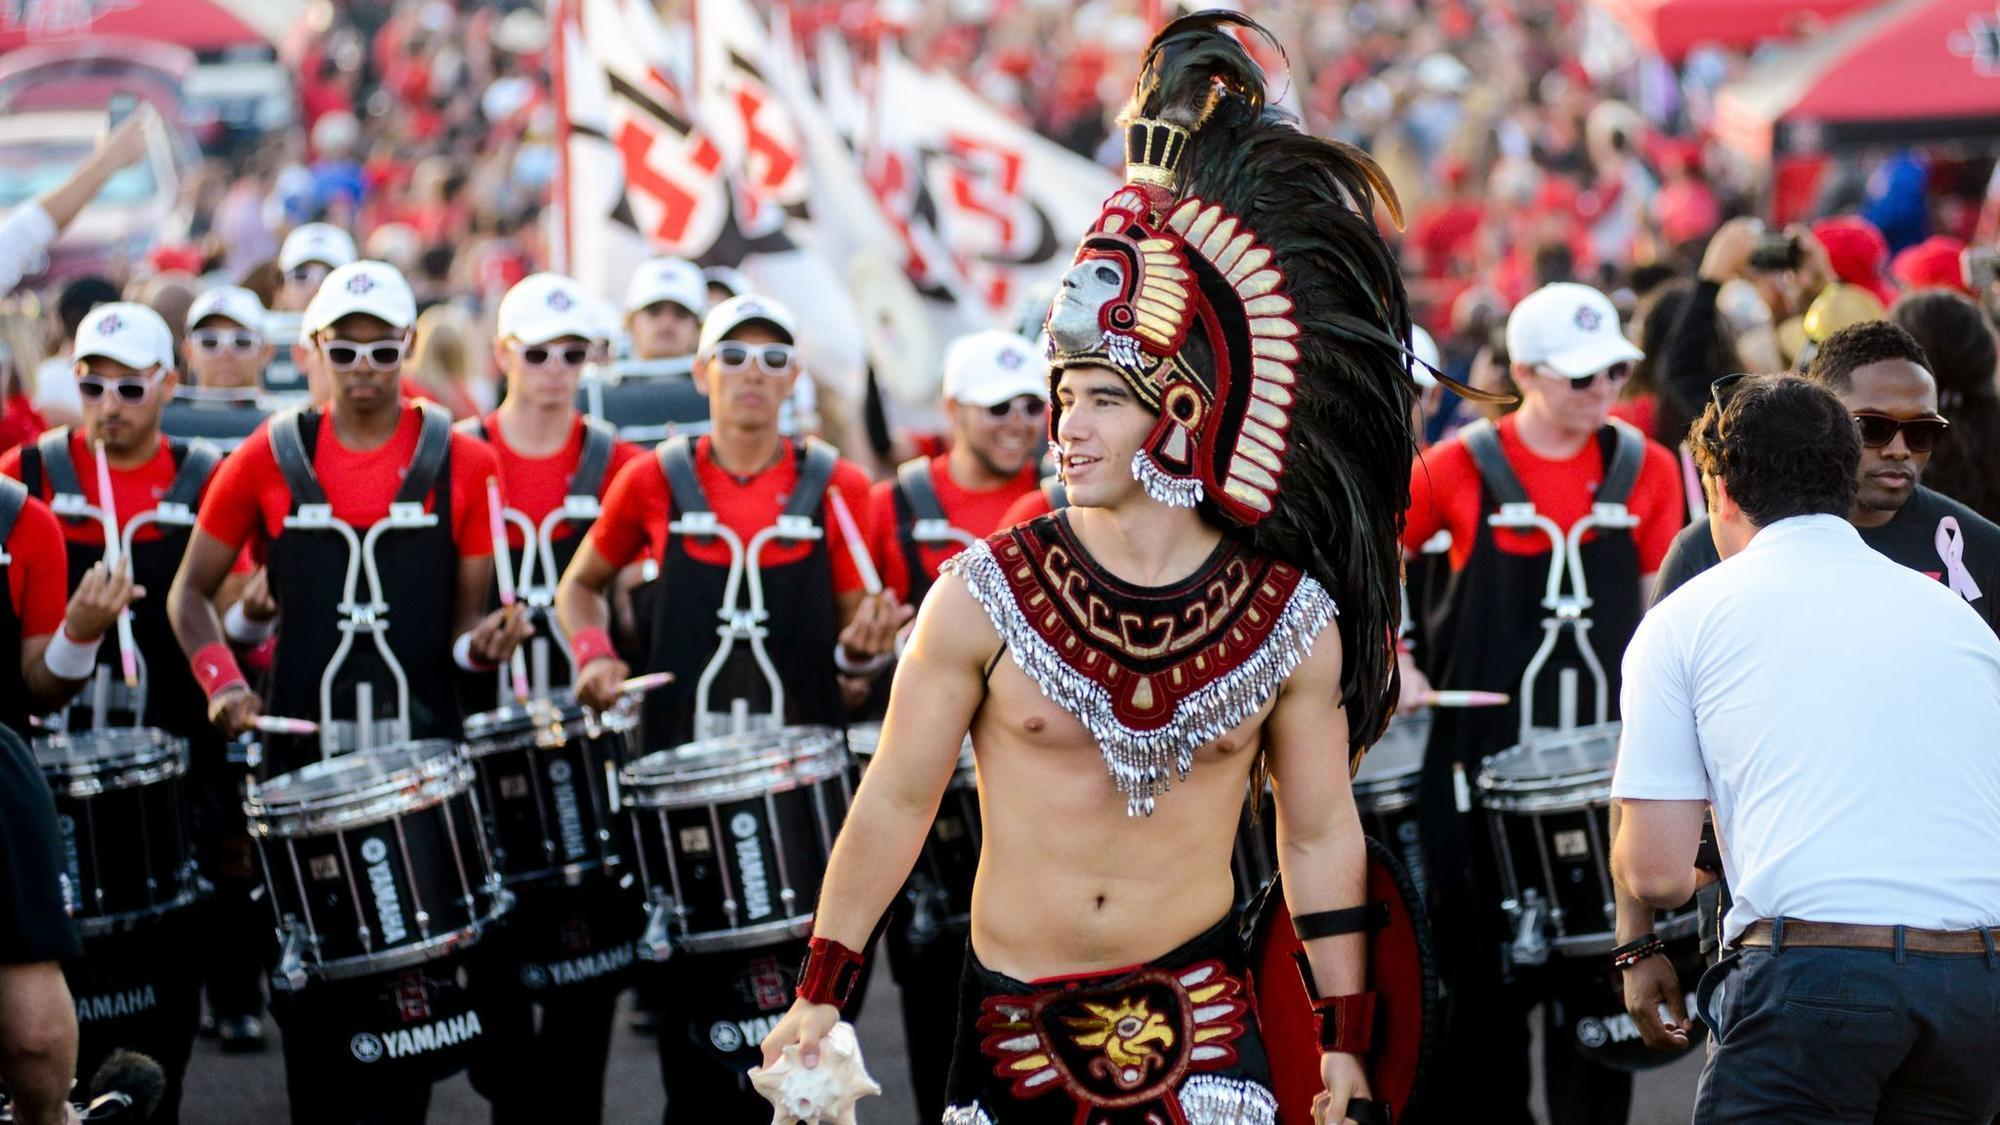 Sd-sp-aztecs-aztec-warrior-survey-sent-to-sdsu-alumni-0213